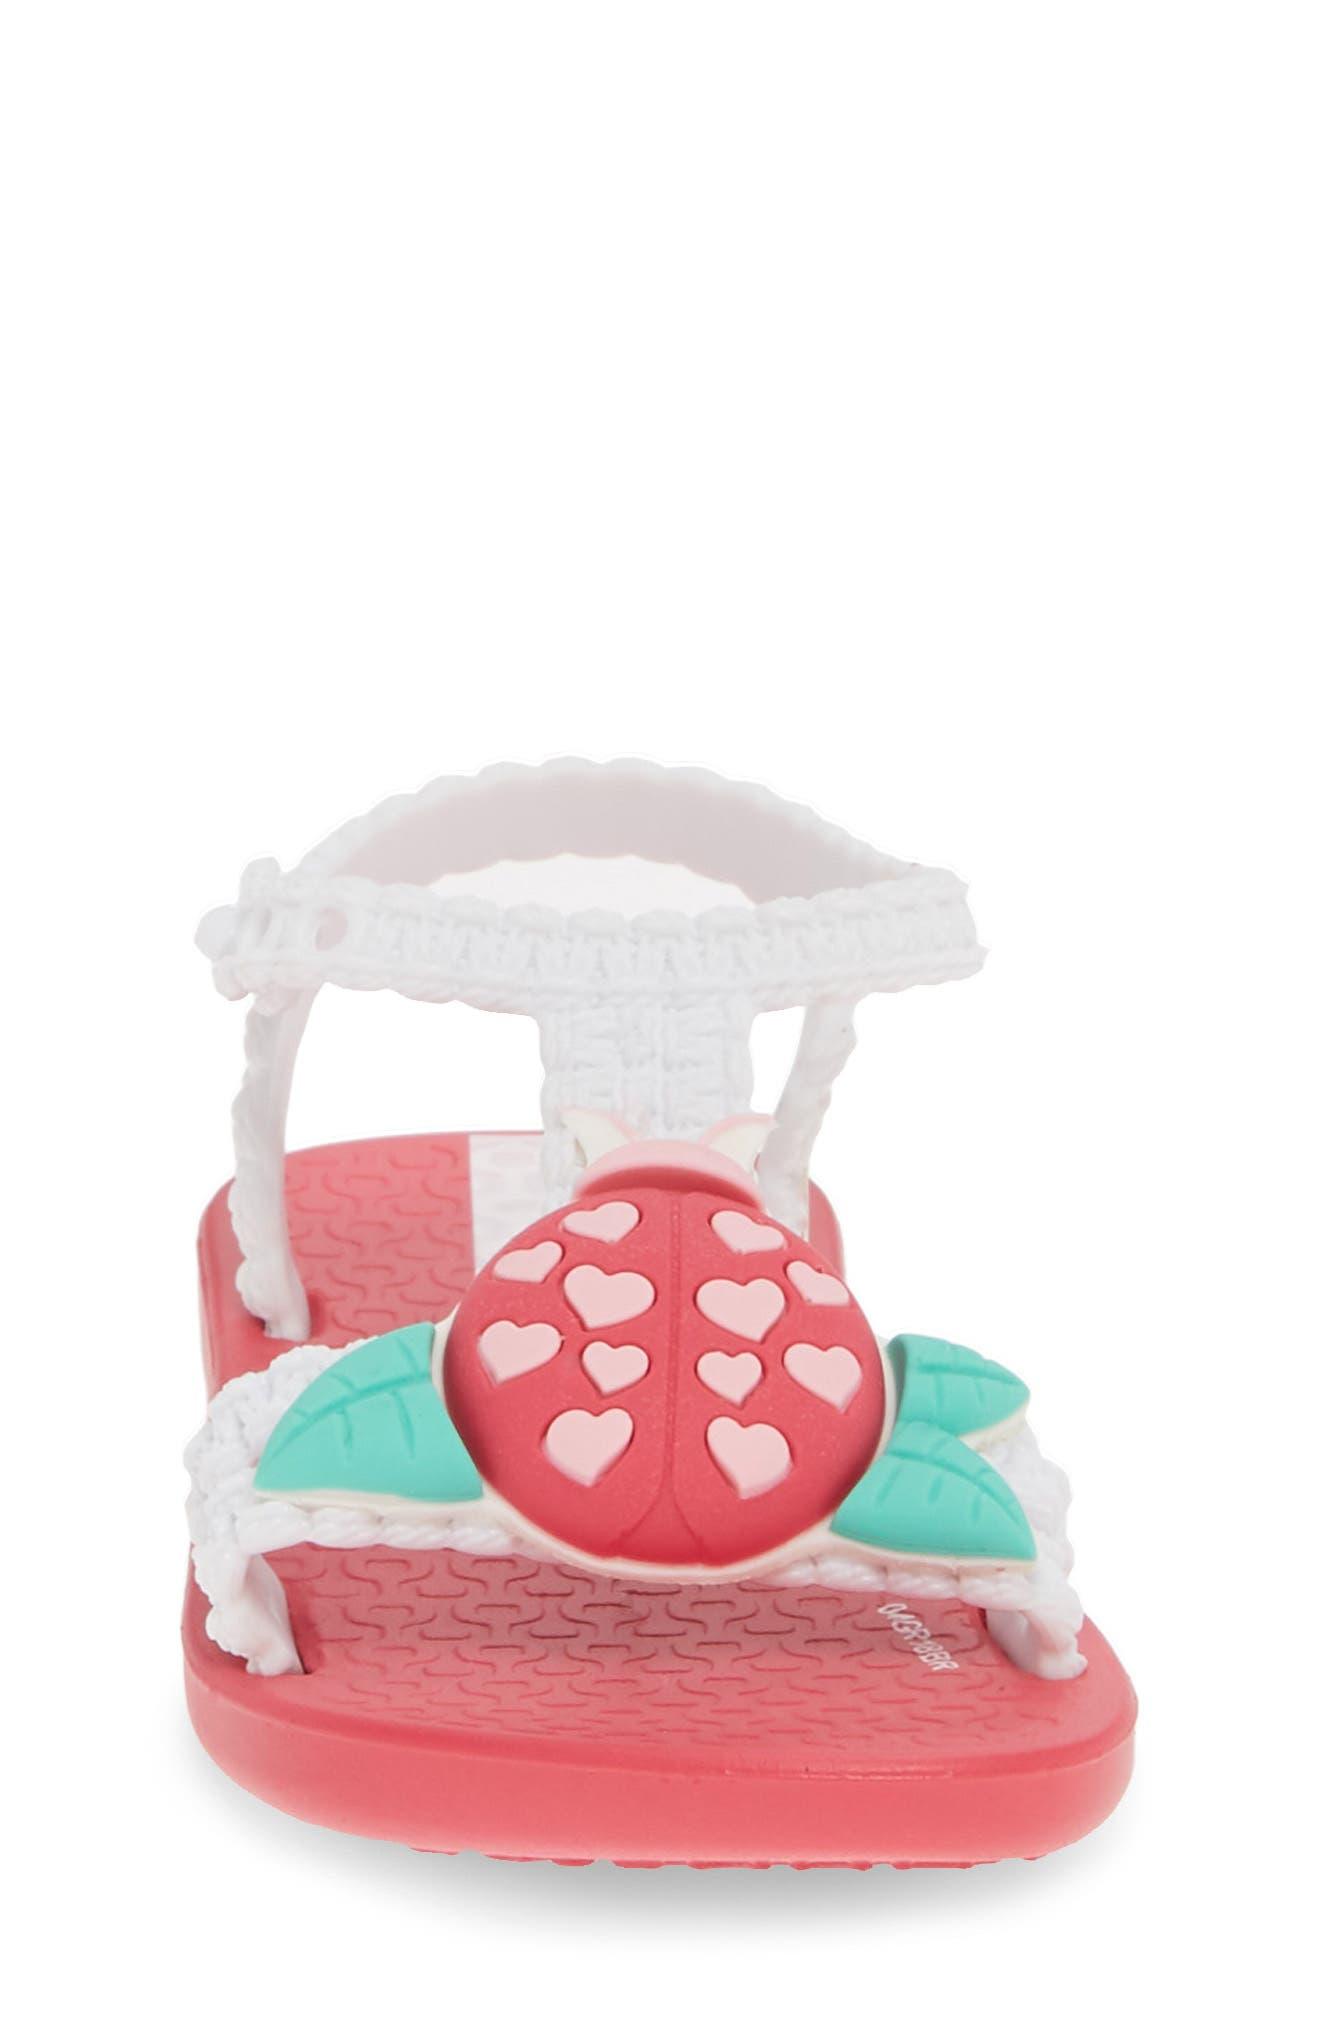 IPANEMA, Buggy Baby Sandal, Alternate thumbnail 4, color, PINK/ WHITE